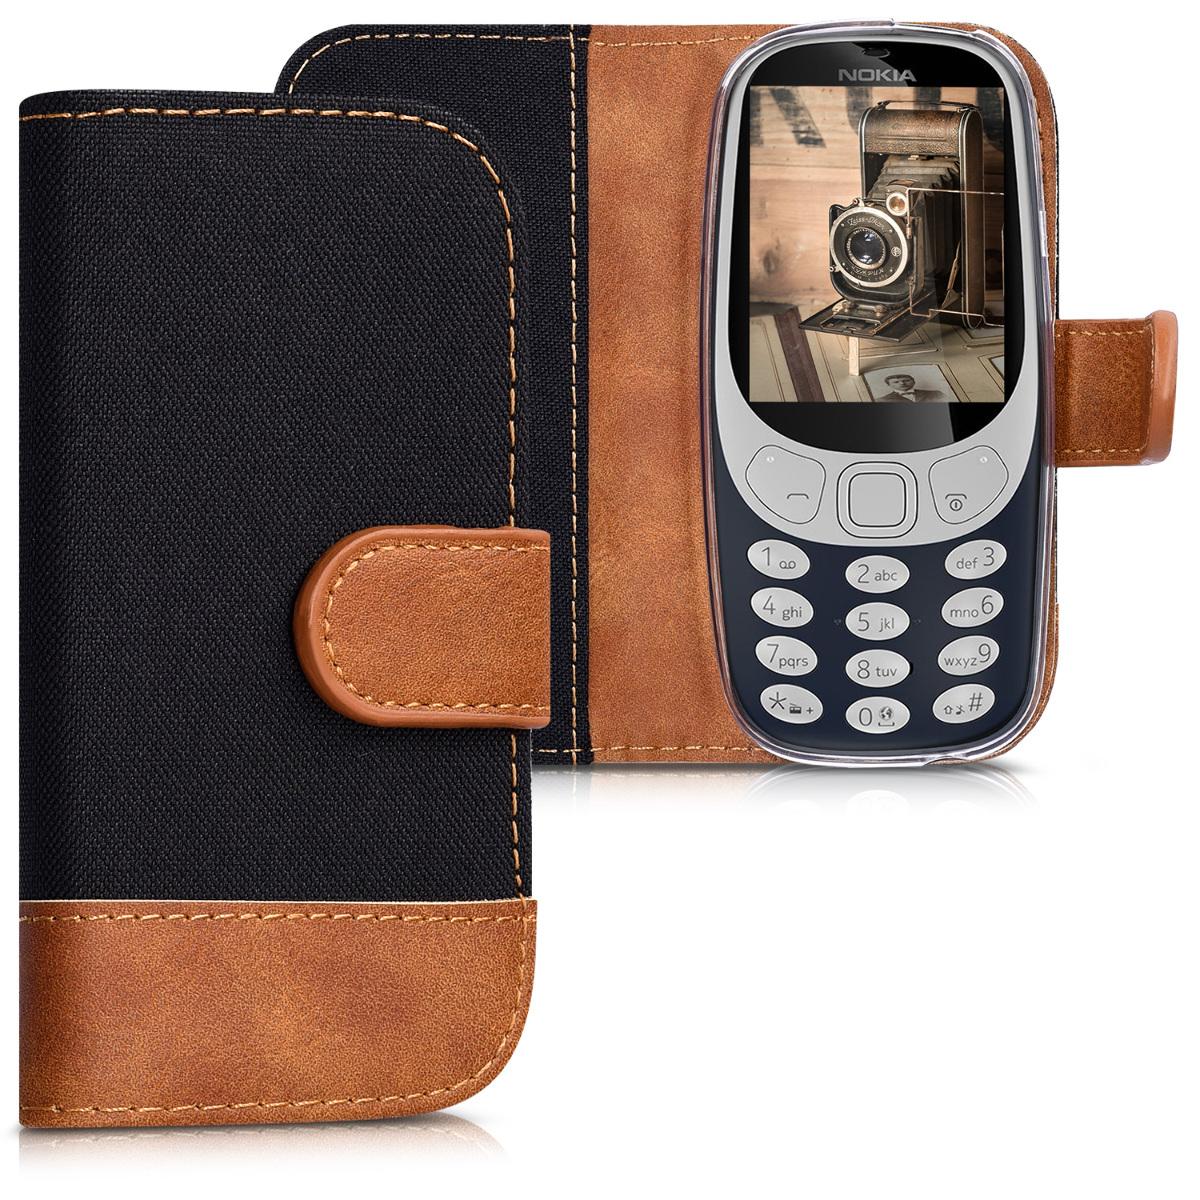 Pouzdro pro Nokia 3310 (2017) černo - hnědé